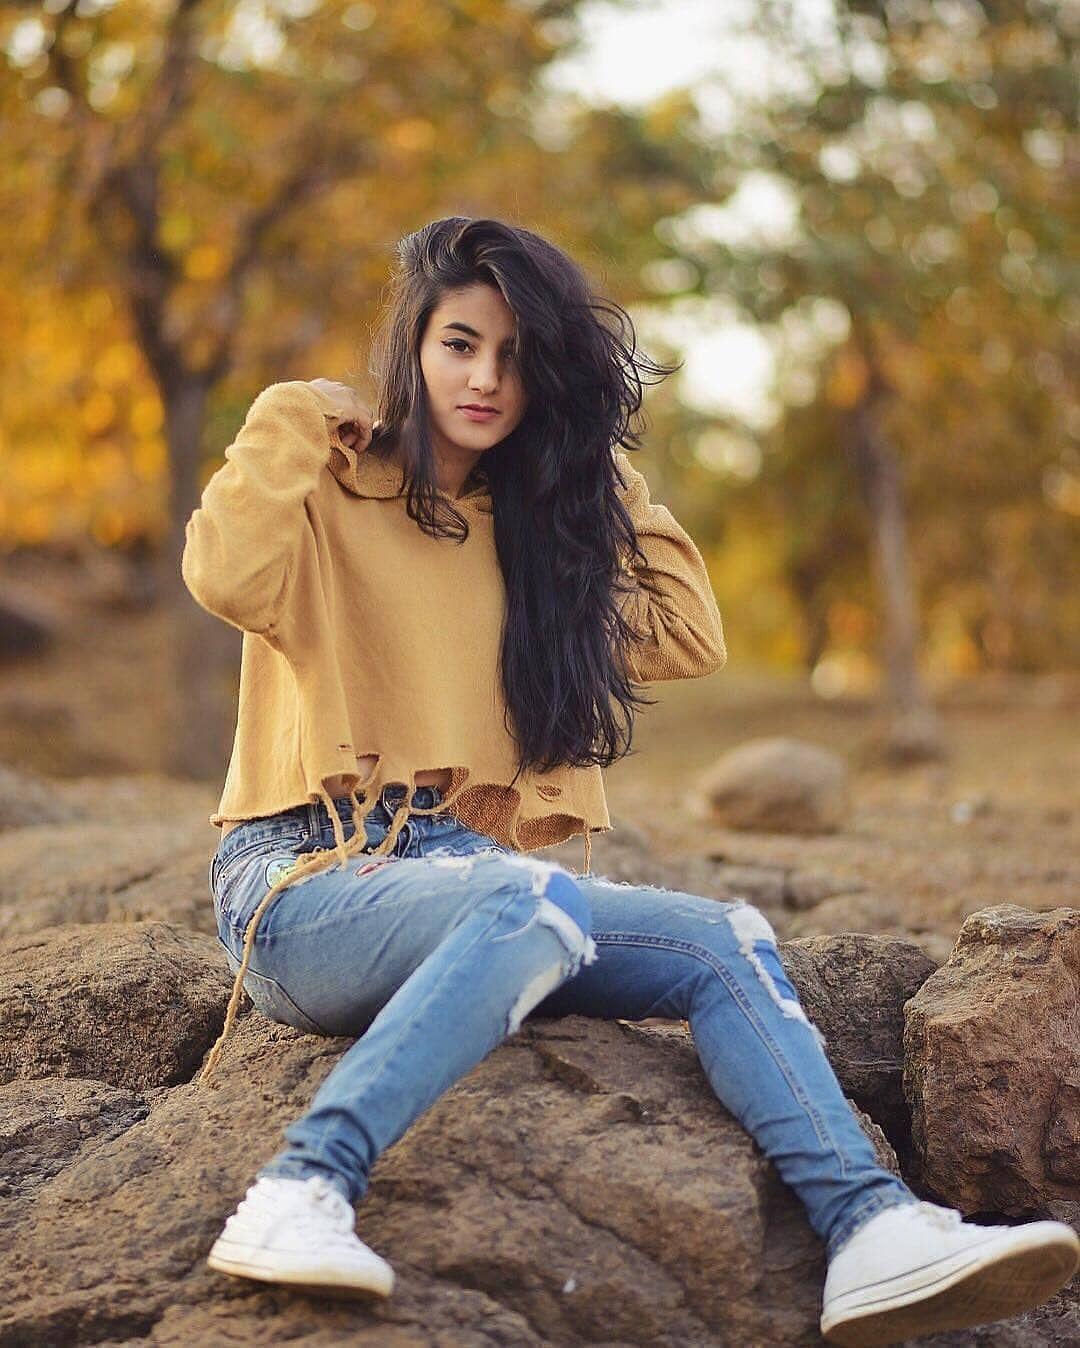 Photo De Profil Swag Girl 2019